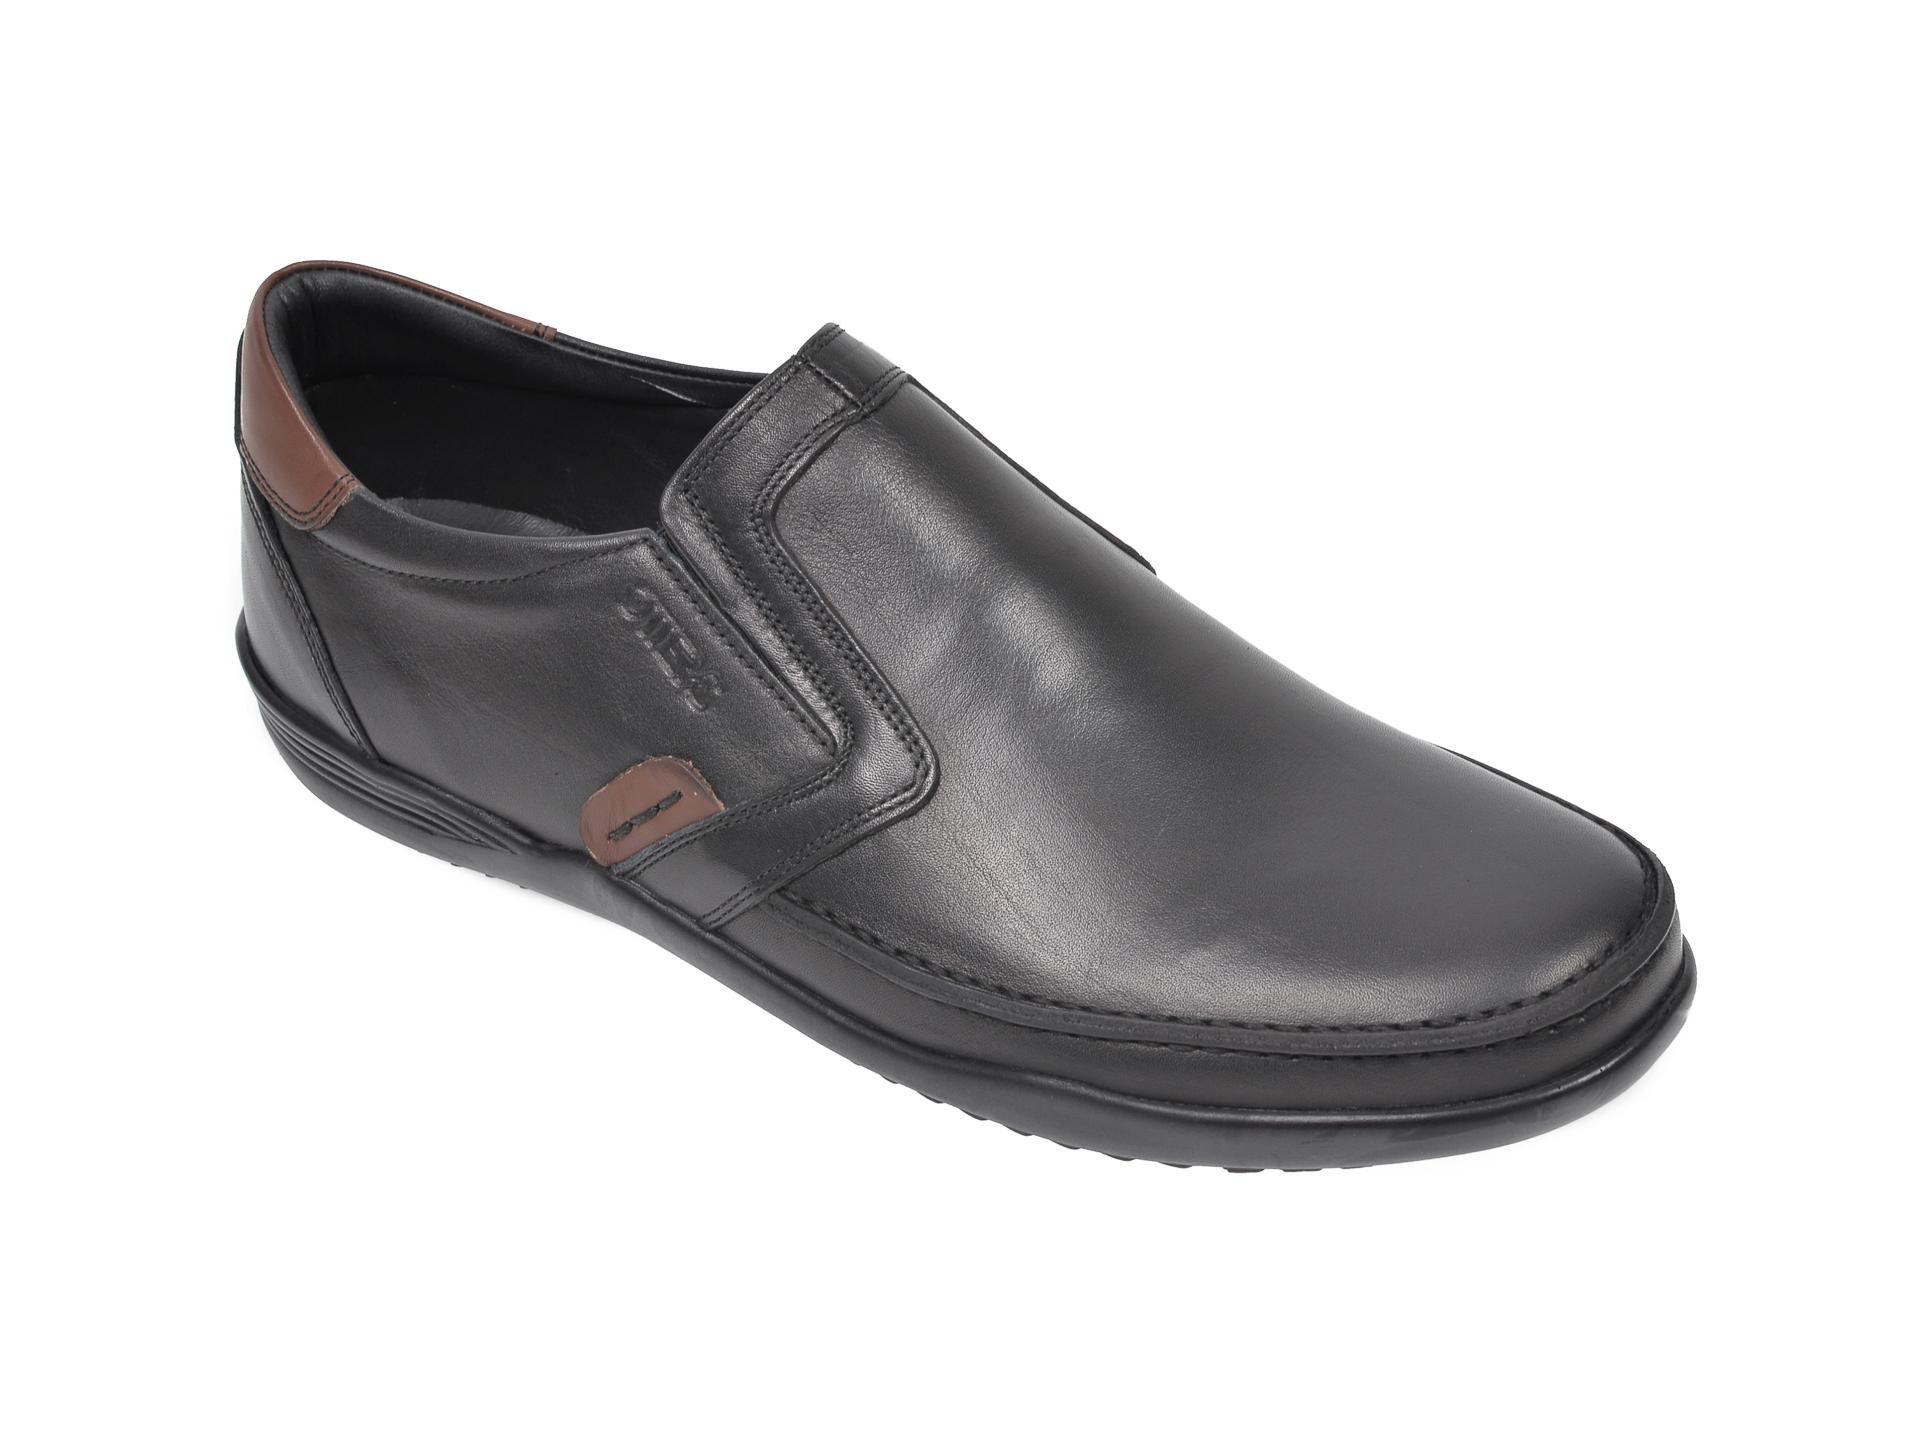 Pantofi OTTER negri, 220, din piele naturala imagine